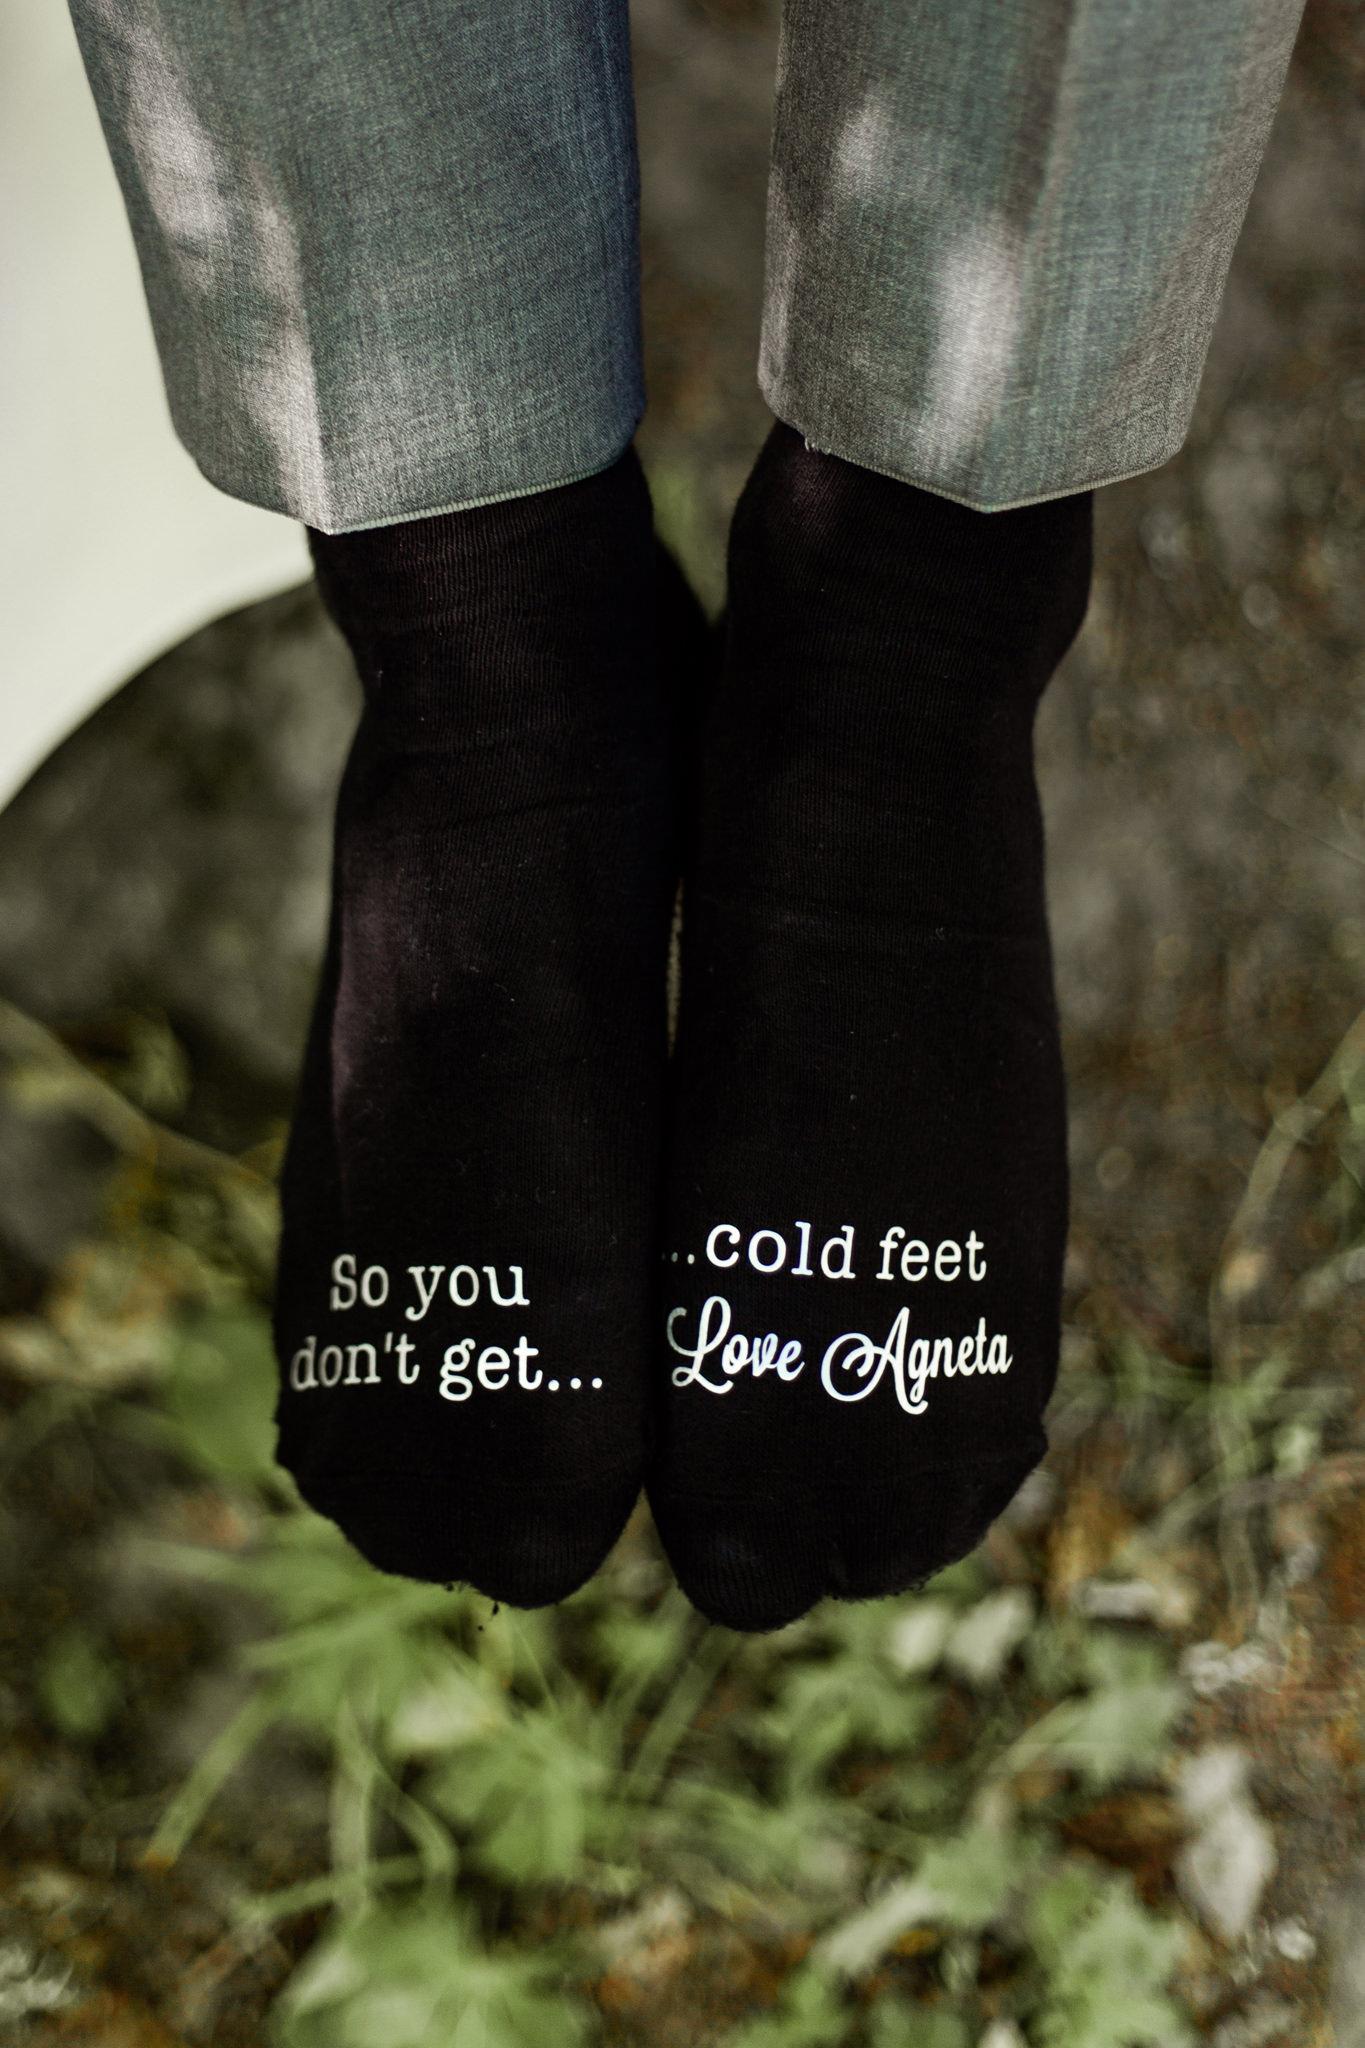 Bröllopsstrumpor so you don't get cold feet